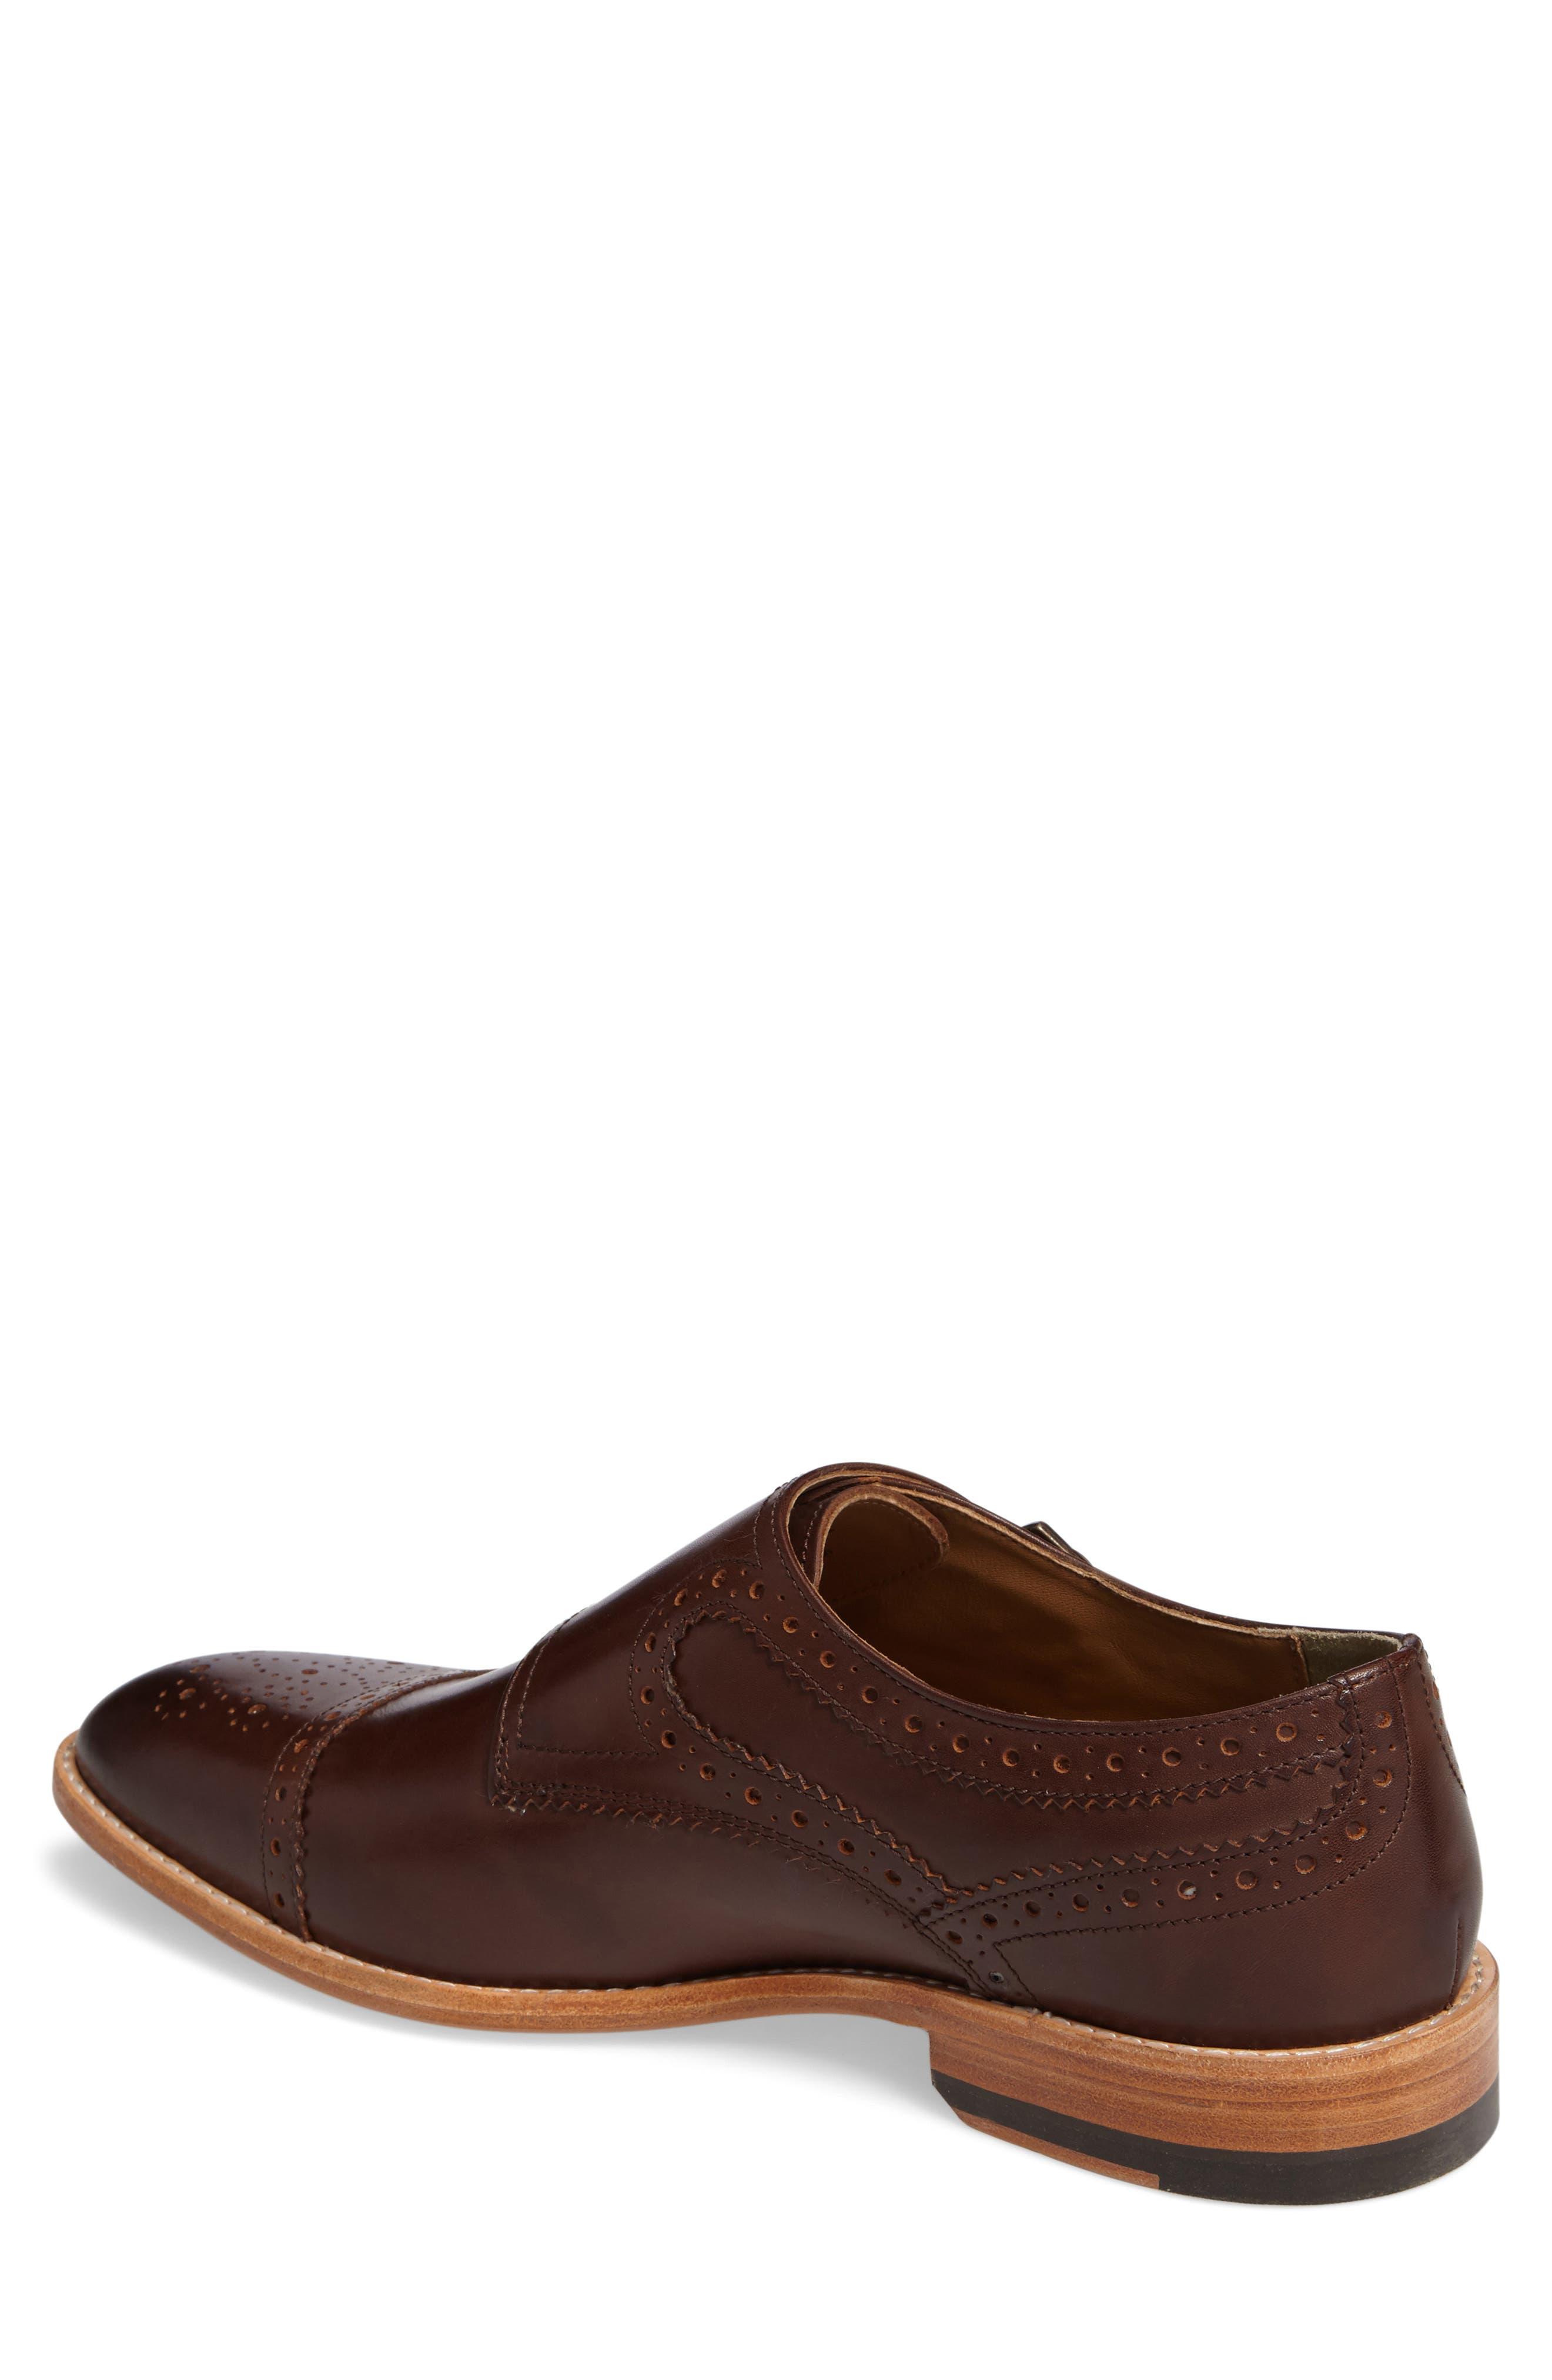 Vance Cap Toe Monk Shoe,                             Alternate thumbnail 2, color,